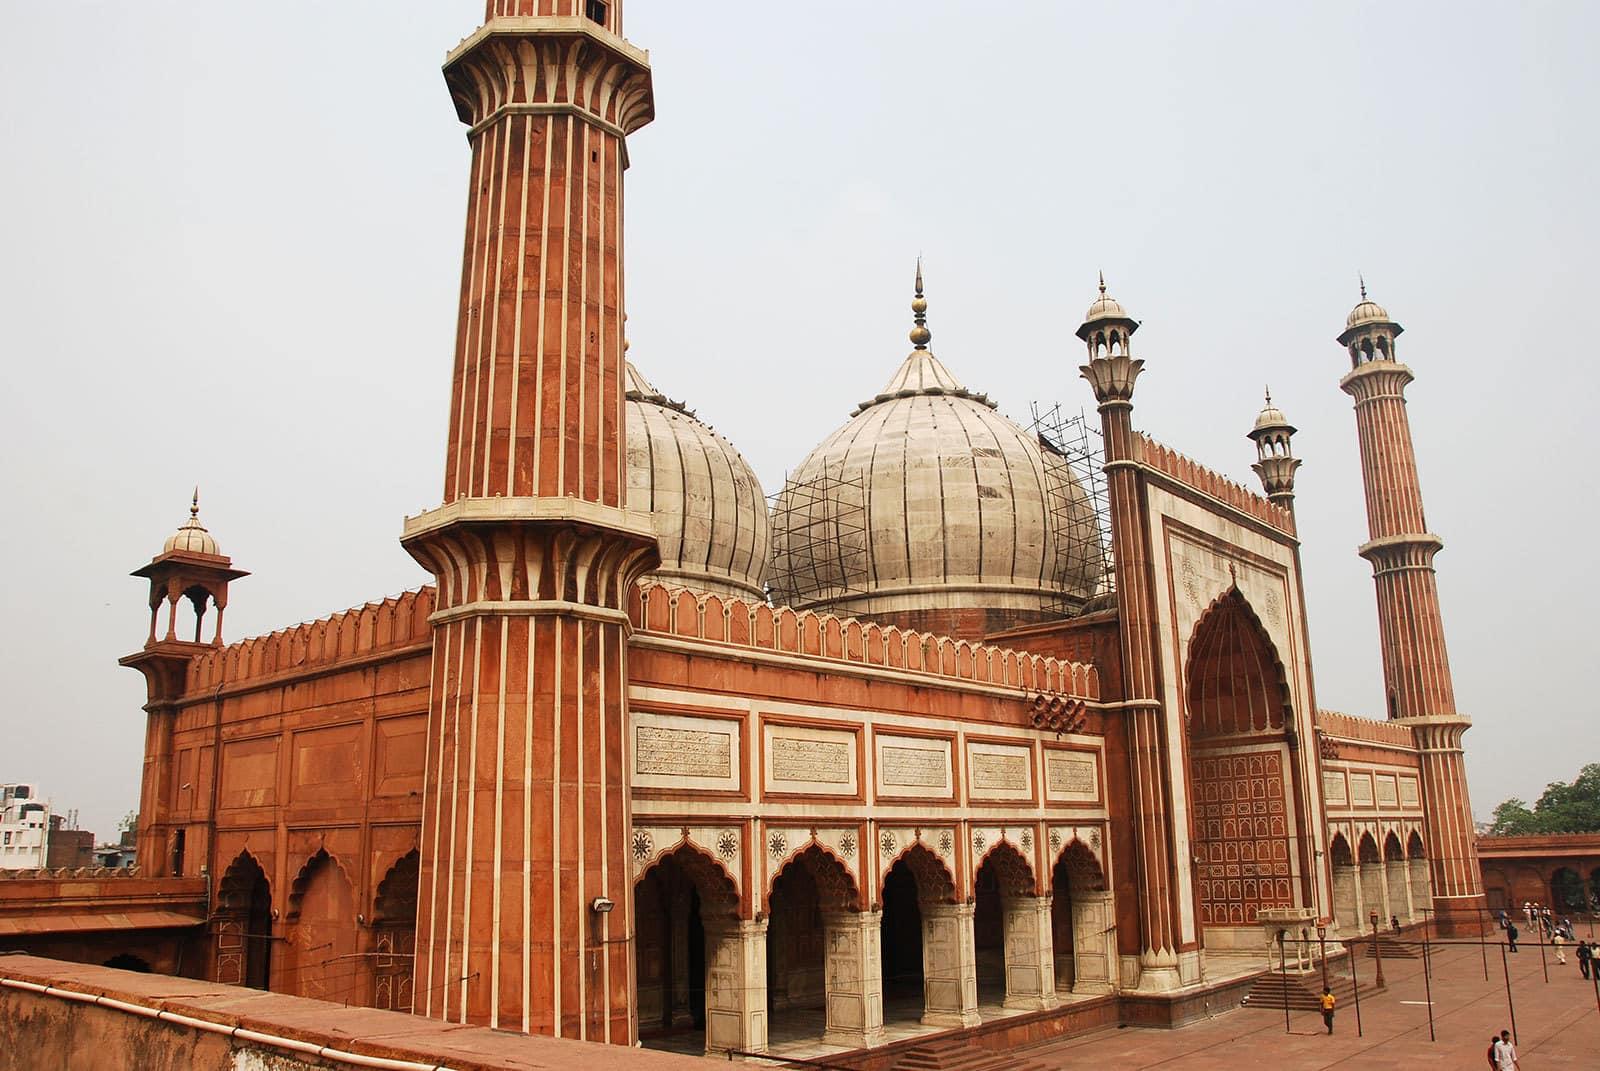 La mosquée Jama Masjid